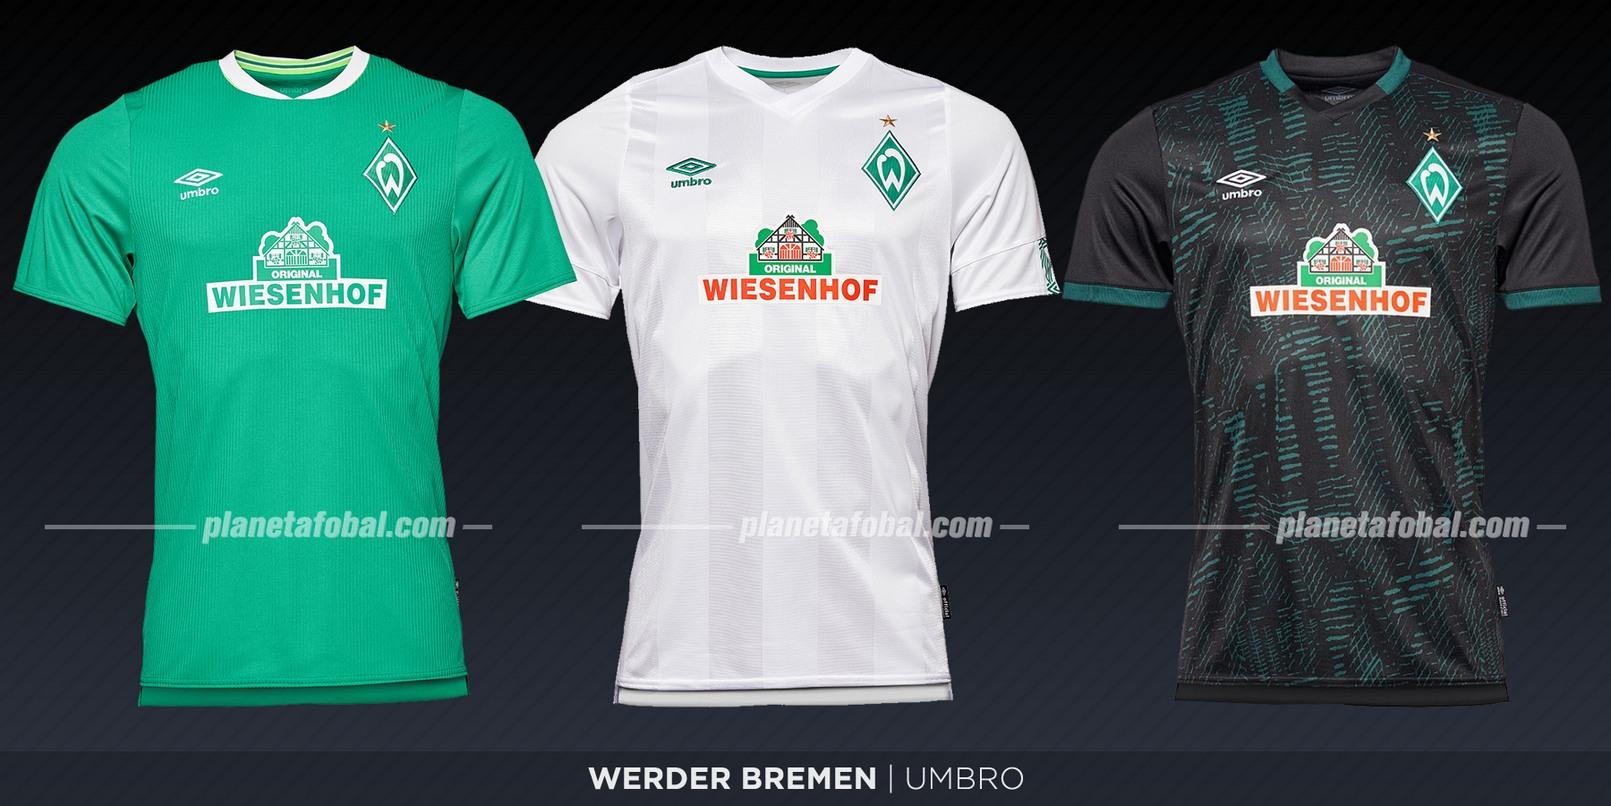 Werder Bremen (Umbro) | Camisetas de la Bundesliga 2019-2020